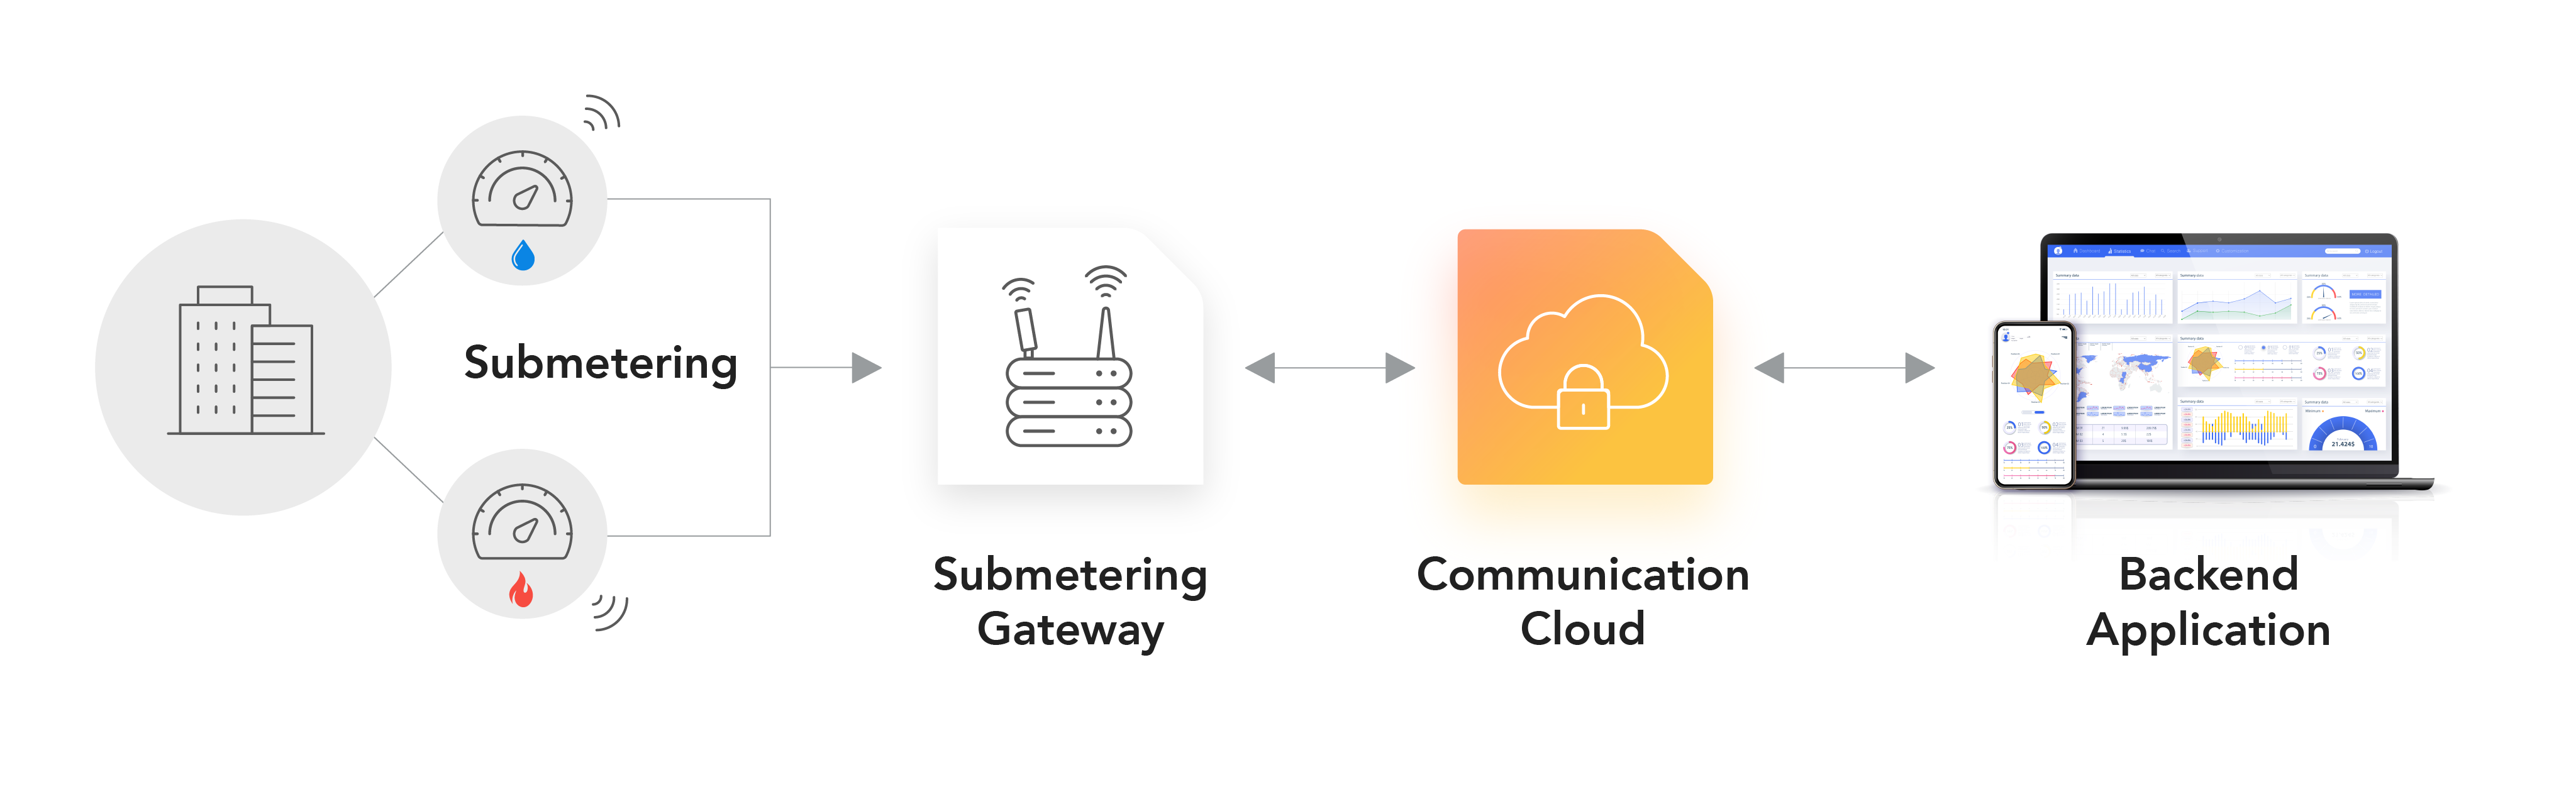 smart-meter-network-architecture